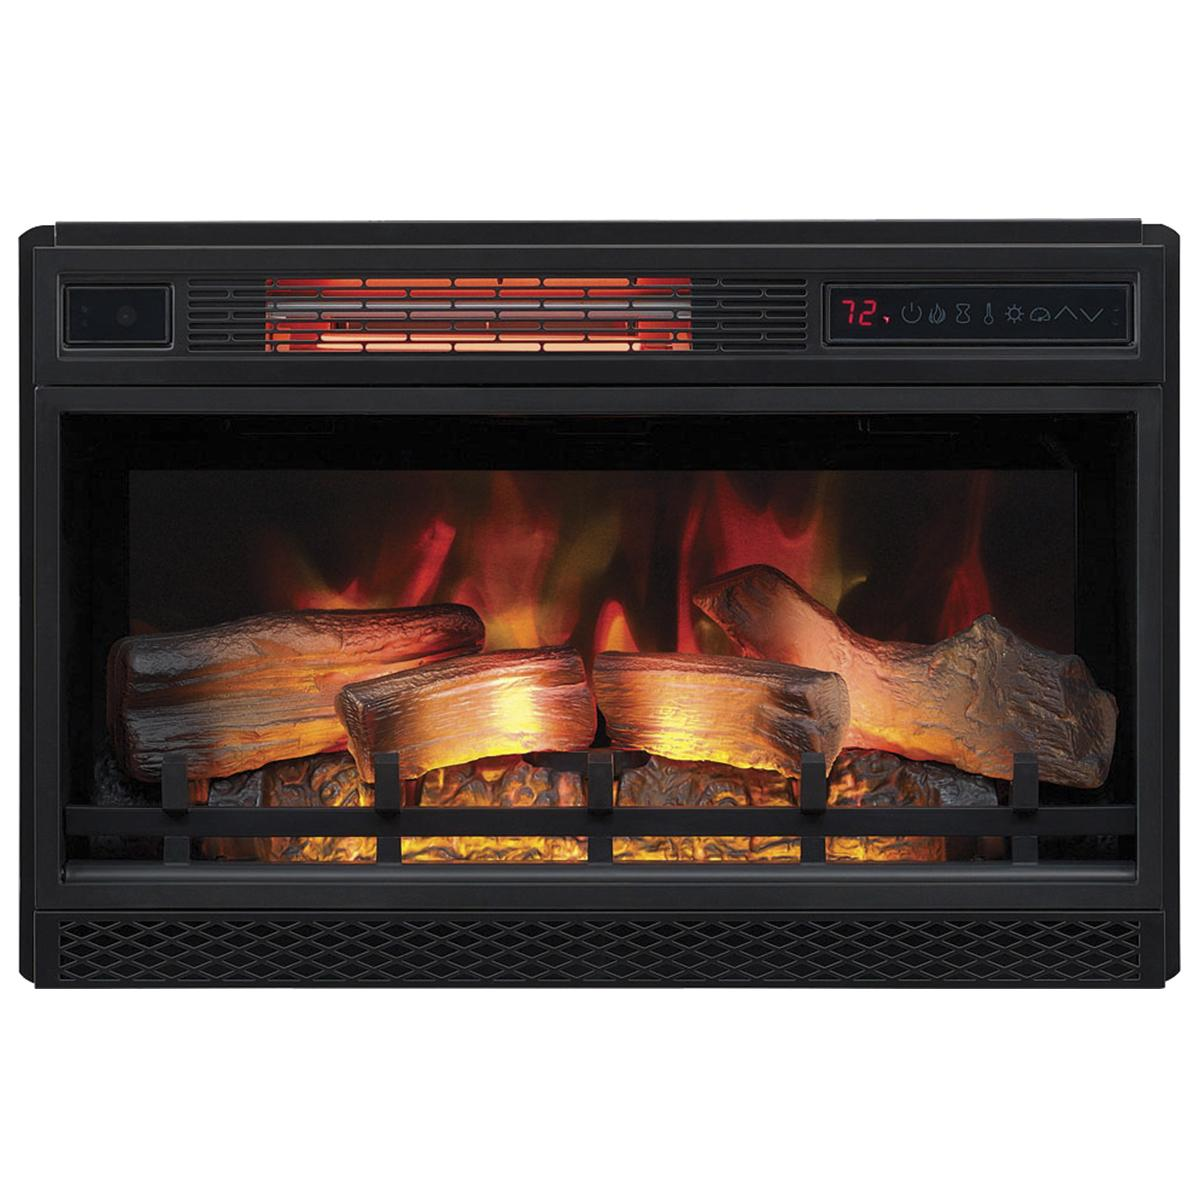 Digital Fireplace Lovely Fabio Flames Greatlin 3 Piece Fireplace Entertainment Wall